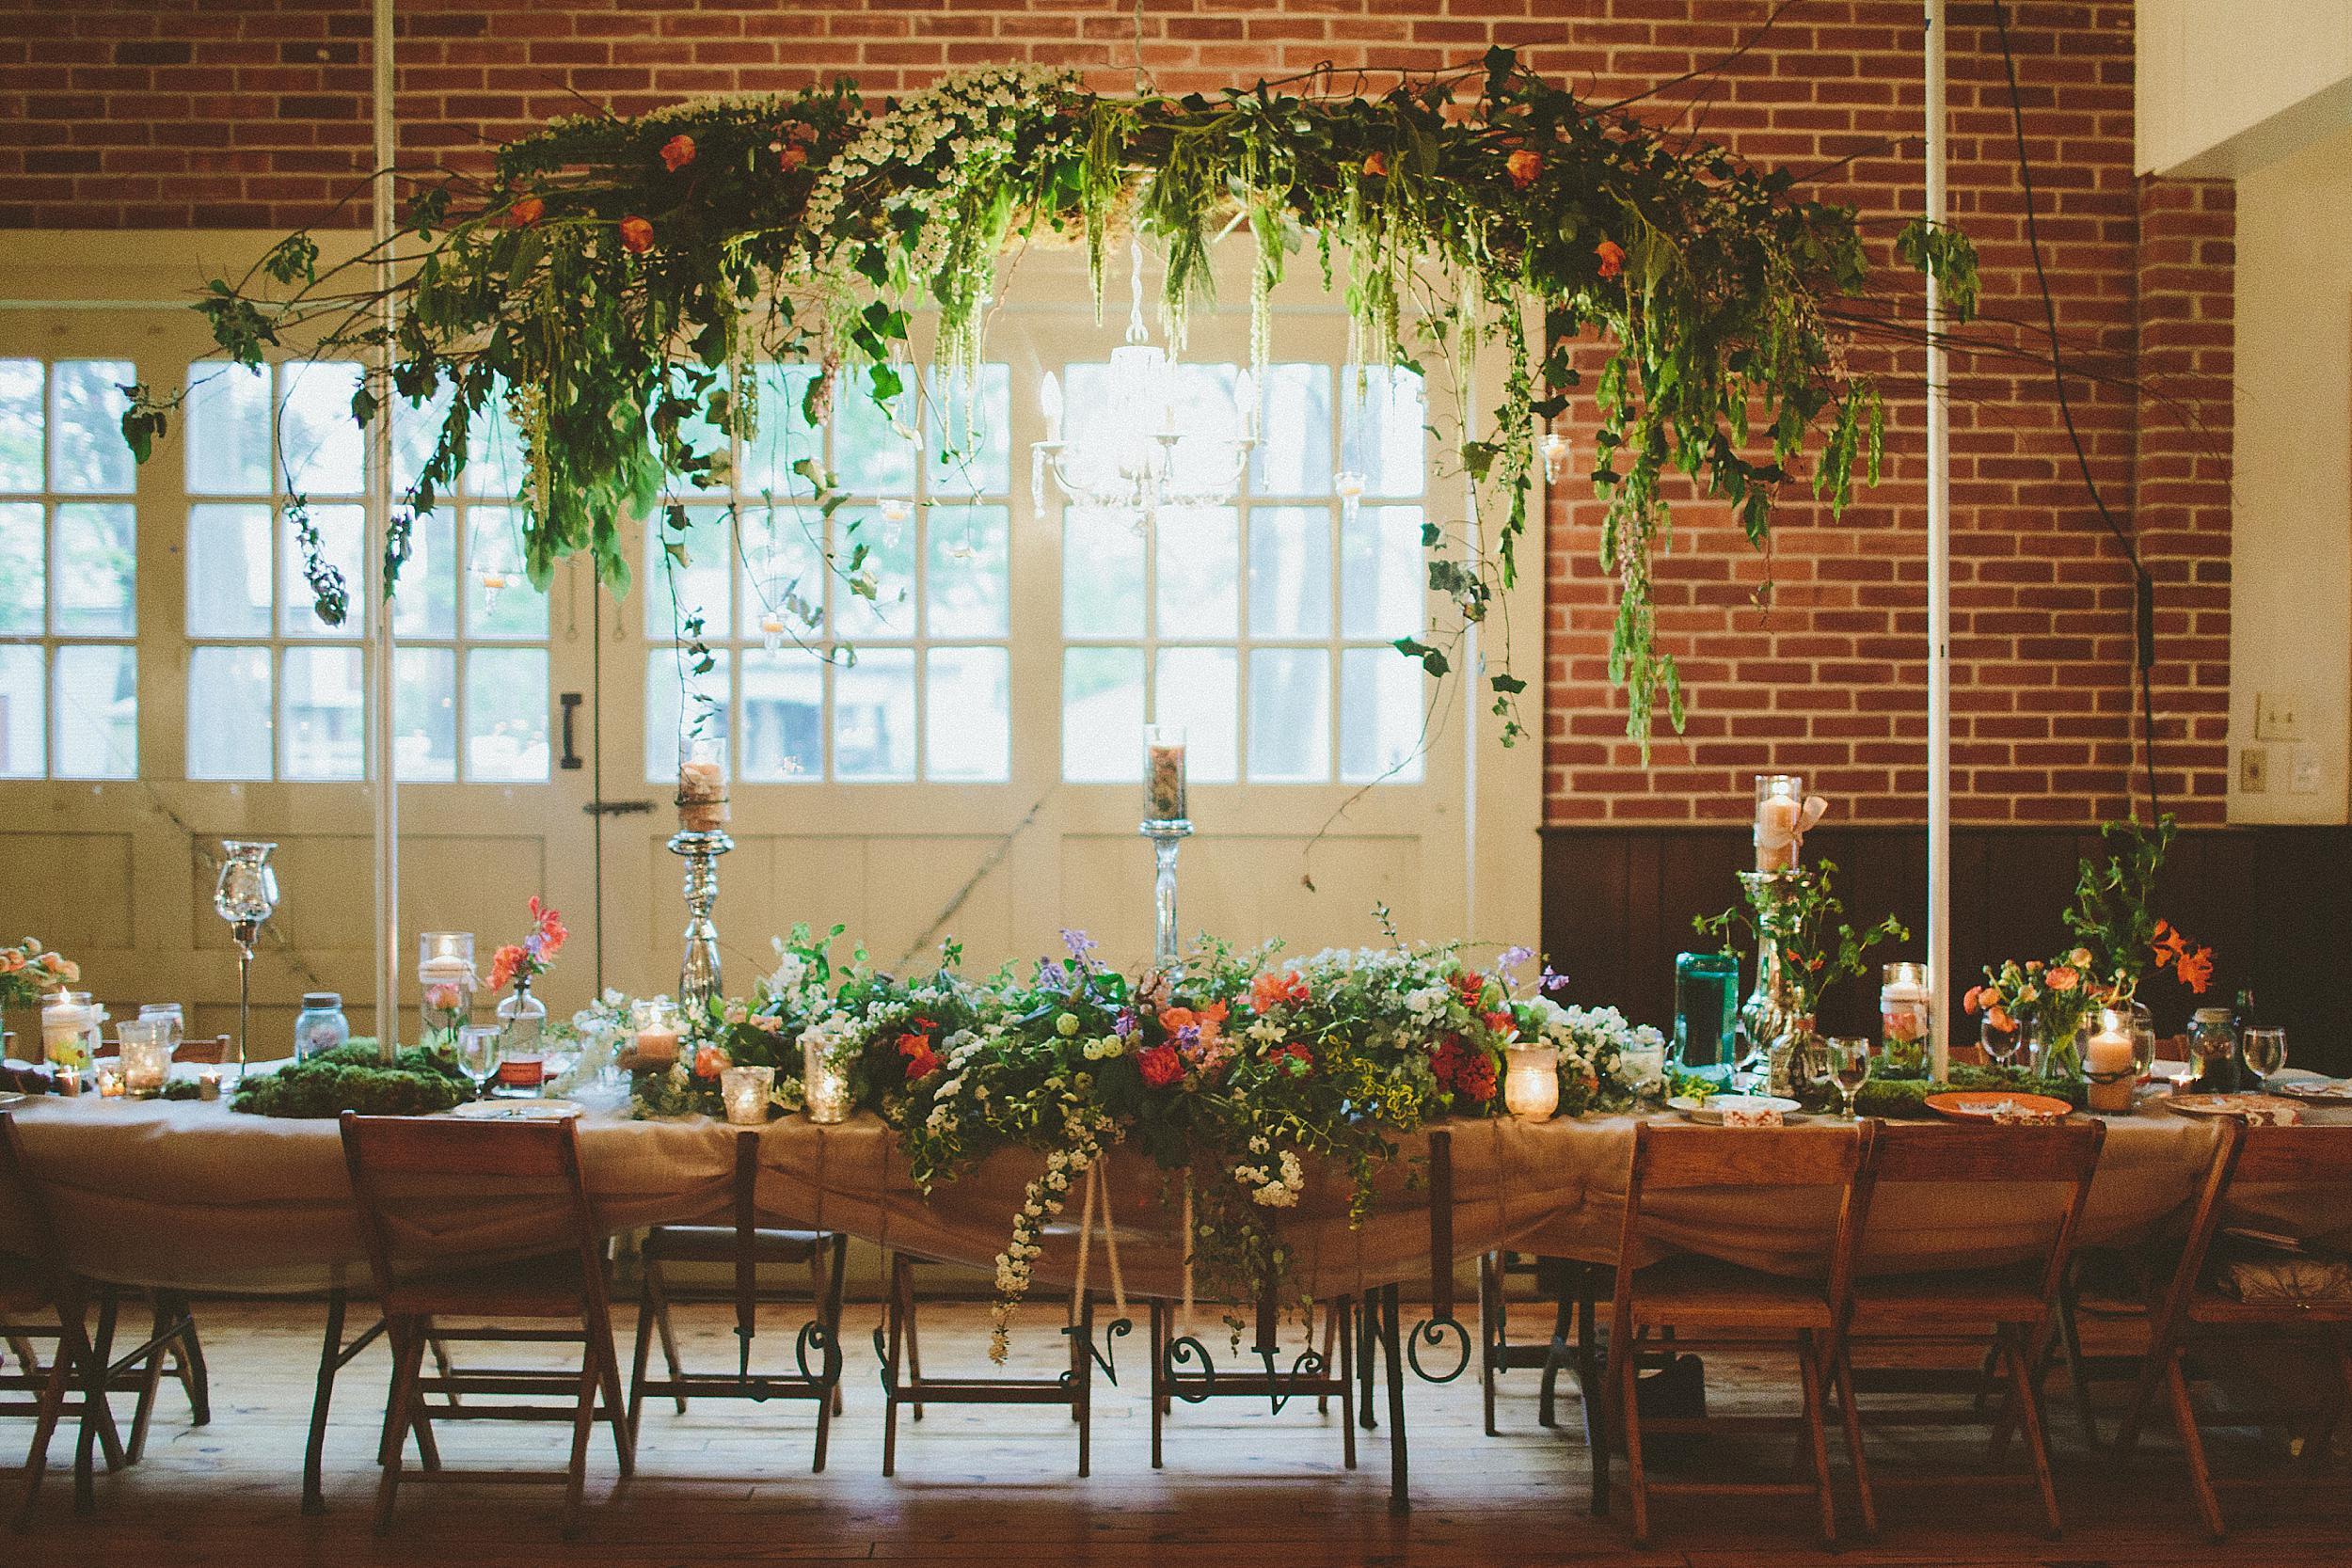 tara_jason_wedding_landis_valley_museum_with_love_and_embers-202.JPG